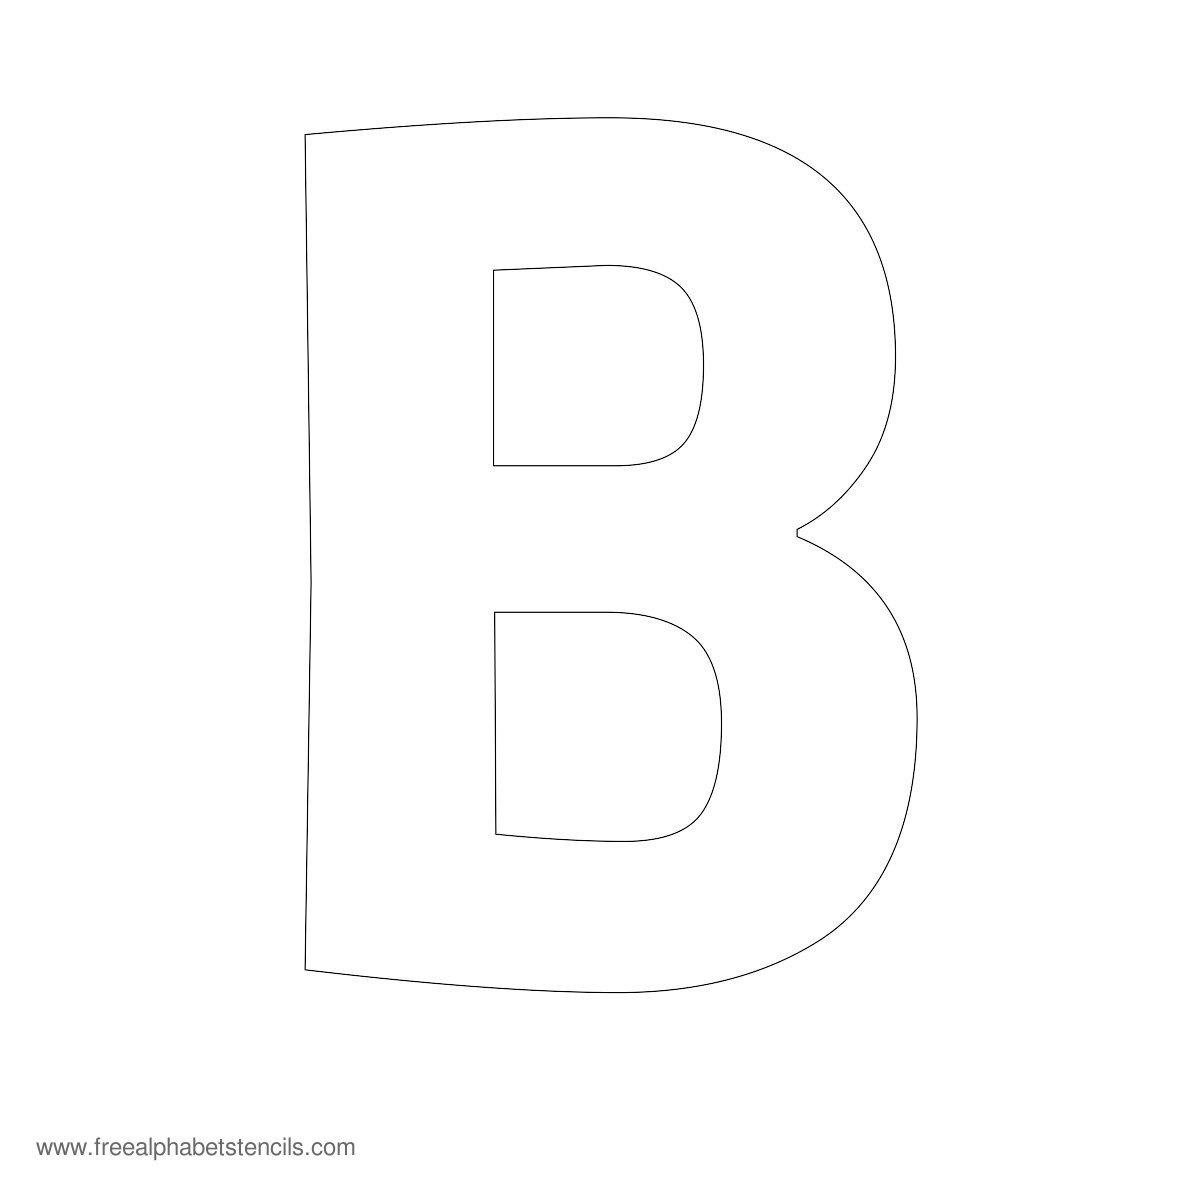 Large Alphabet Stencils | Freealphabetstencils - Printable Alphabet Letters Free Download